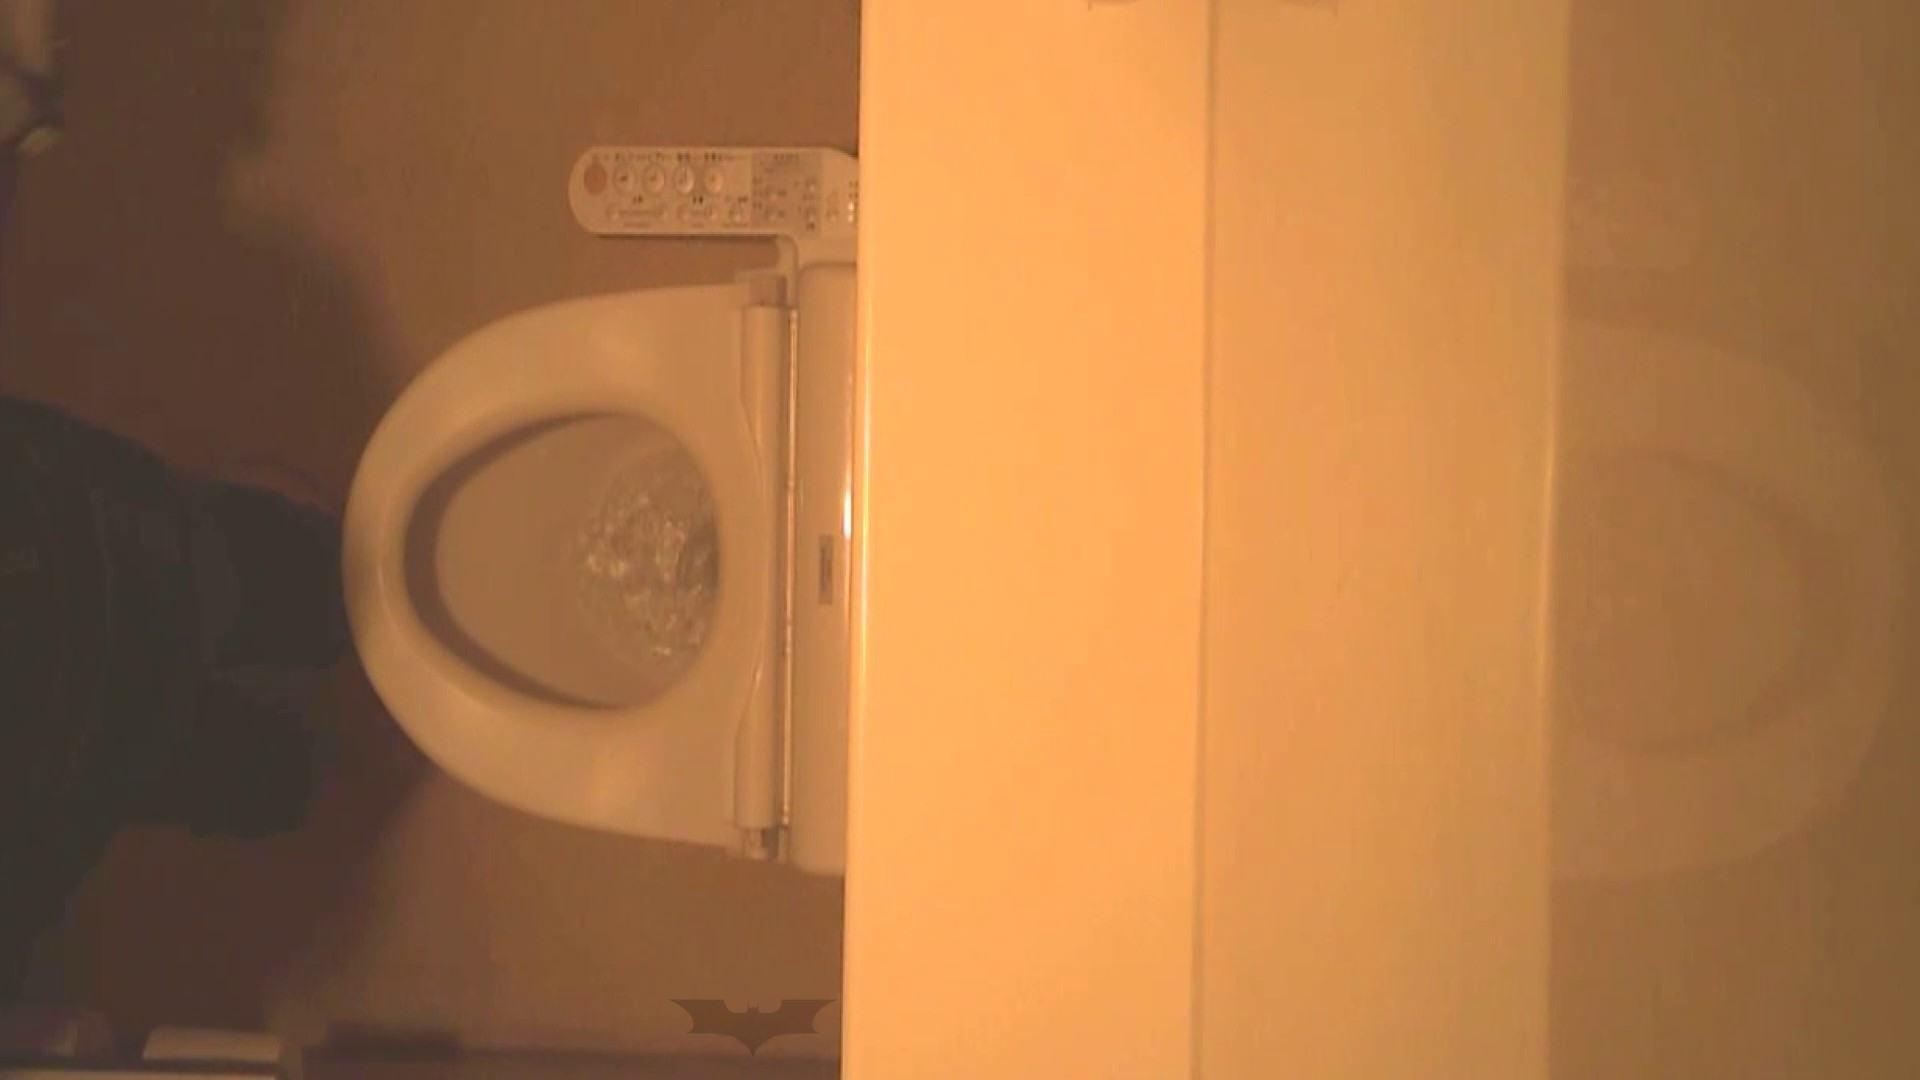 潜入!!全国女子洗面所盗撮 Vol.07 グループ エロ無料画像 80PIX 47